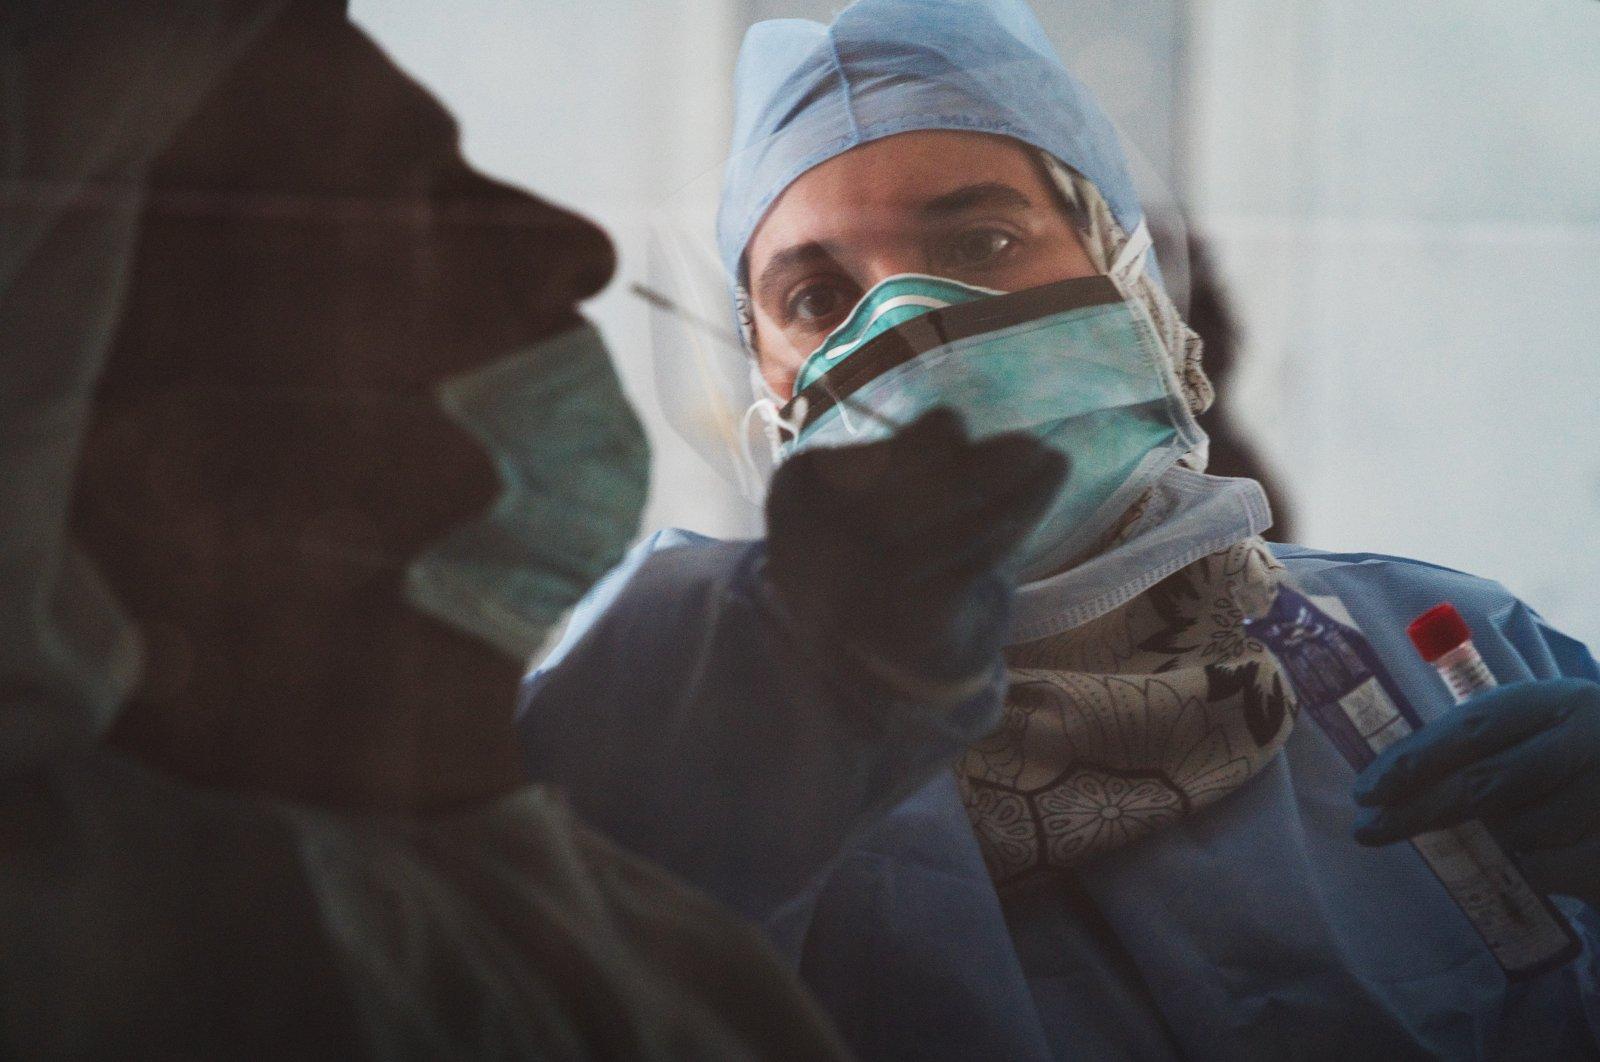 A technician takes a nasal swab for a new coronavirus detection test at a drive-thru testing facility in Abu Dhabi, United Arab Emirates, April 2, 2020. (AP Photo)